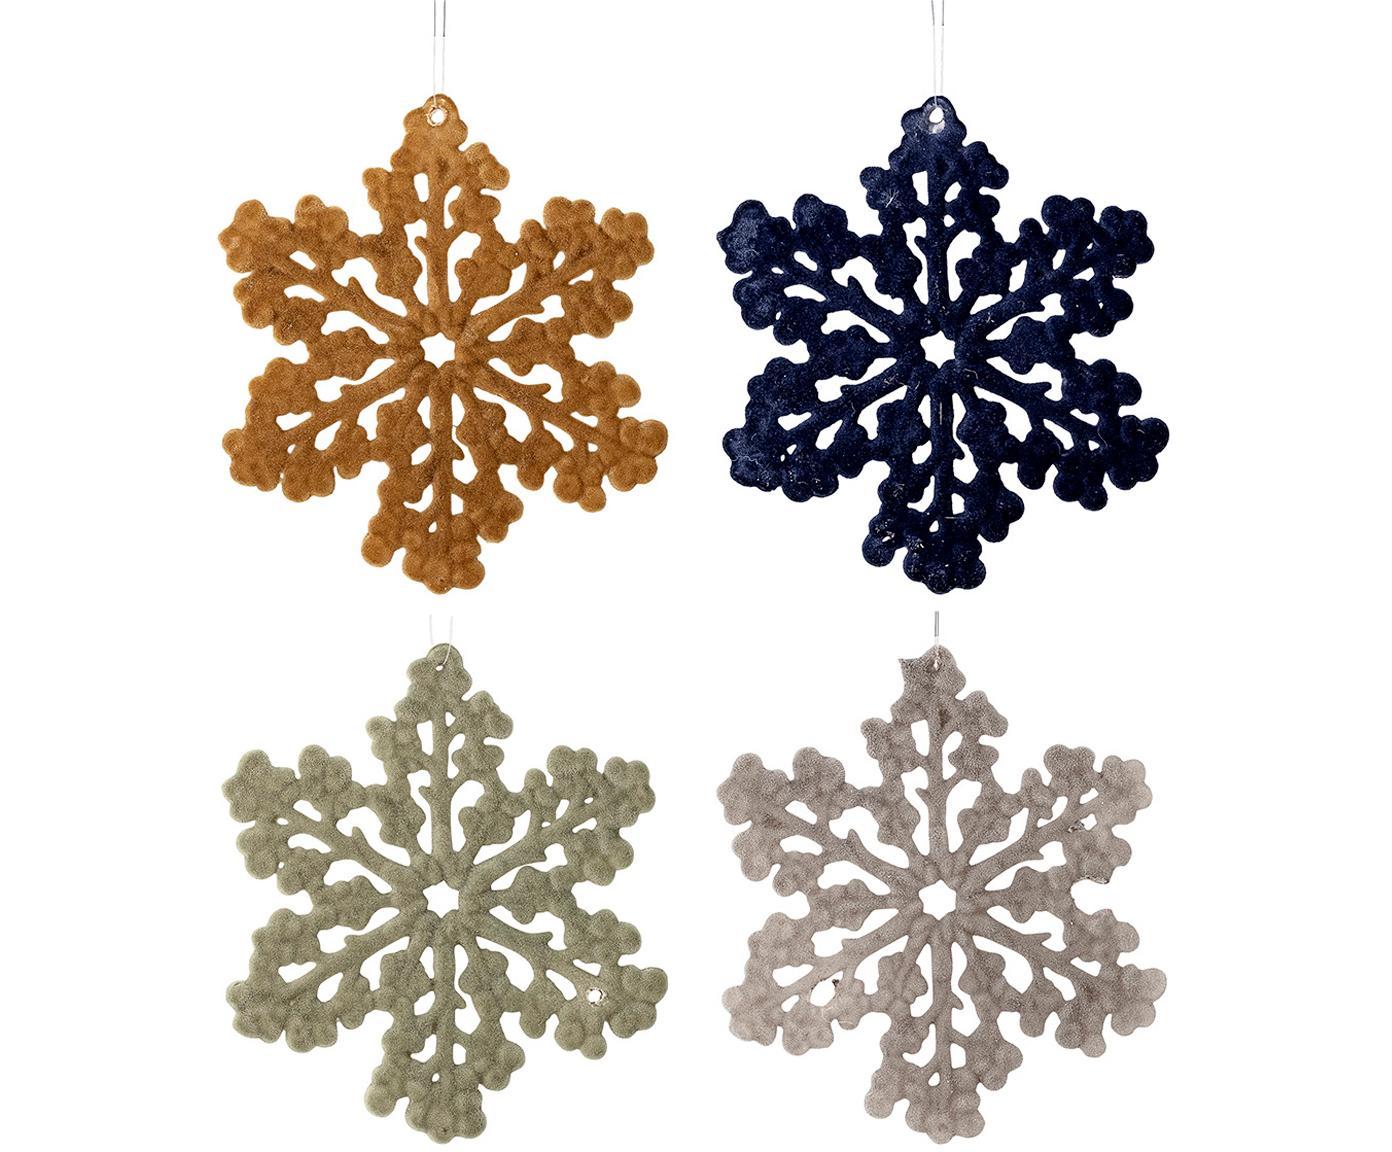 Kerstboomhangersset Snowflakes, 4-delig, Polypropyleen, polyester, Mosterdgeel, donkerblauw, mintgroen, grijs, Ø 12 cm